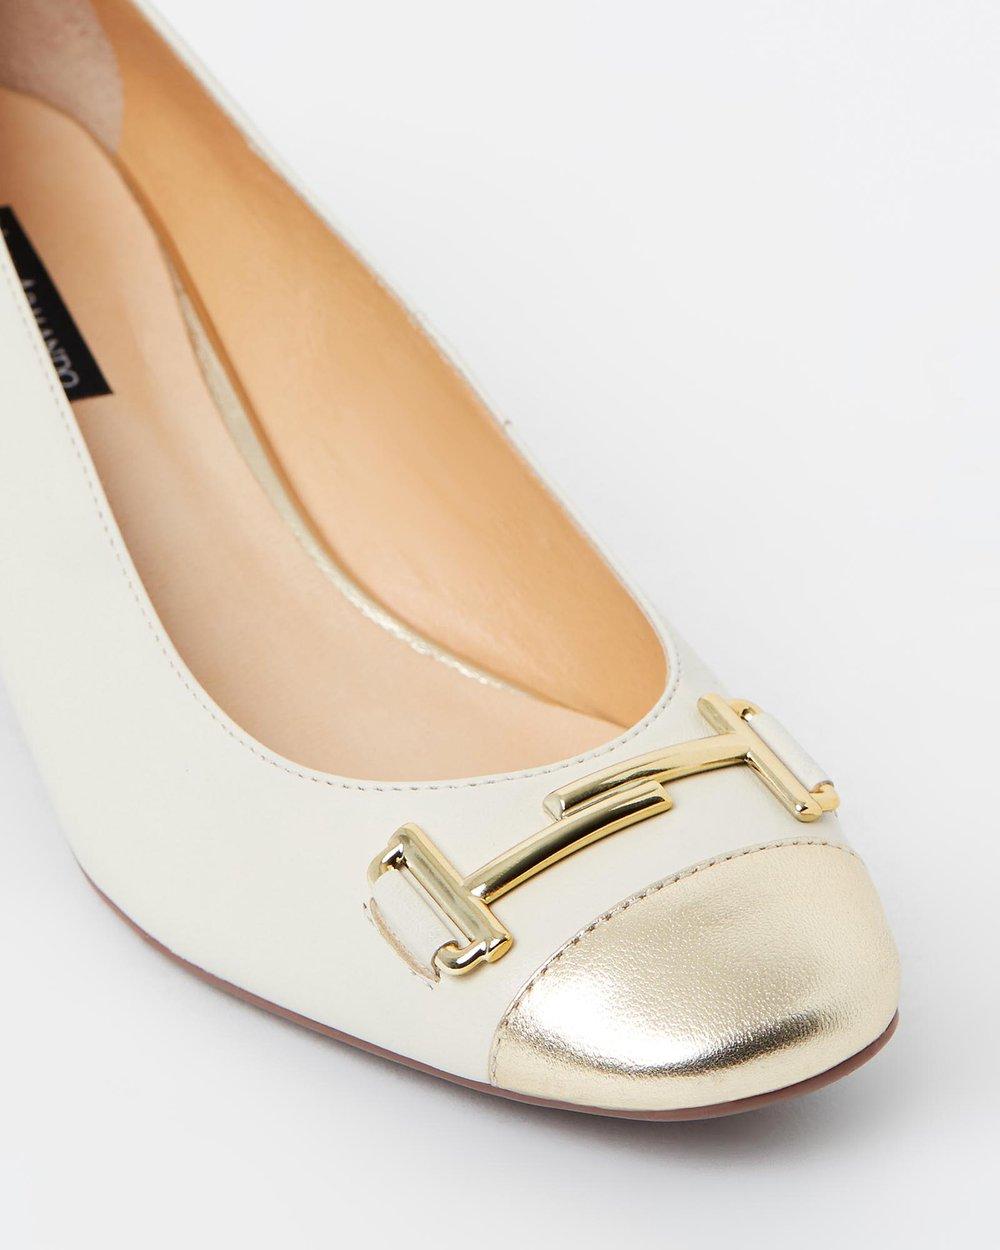 Kristin - Cream & Gold